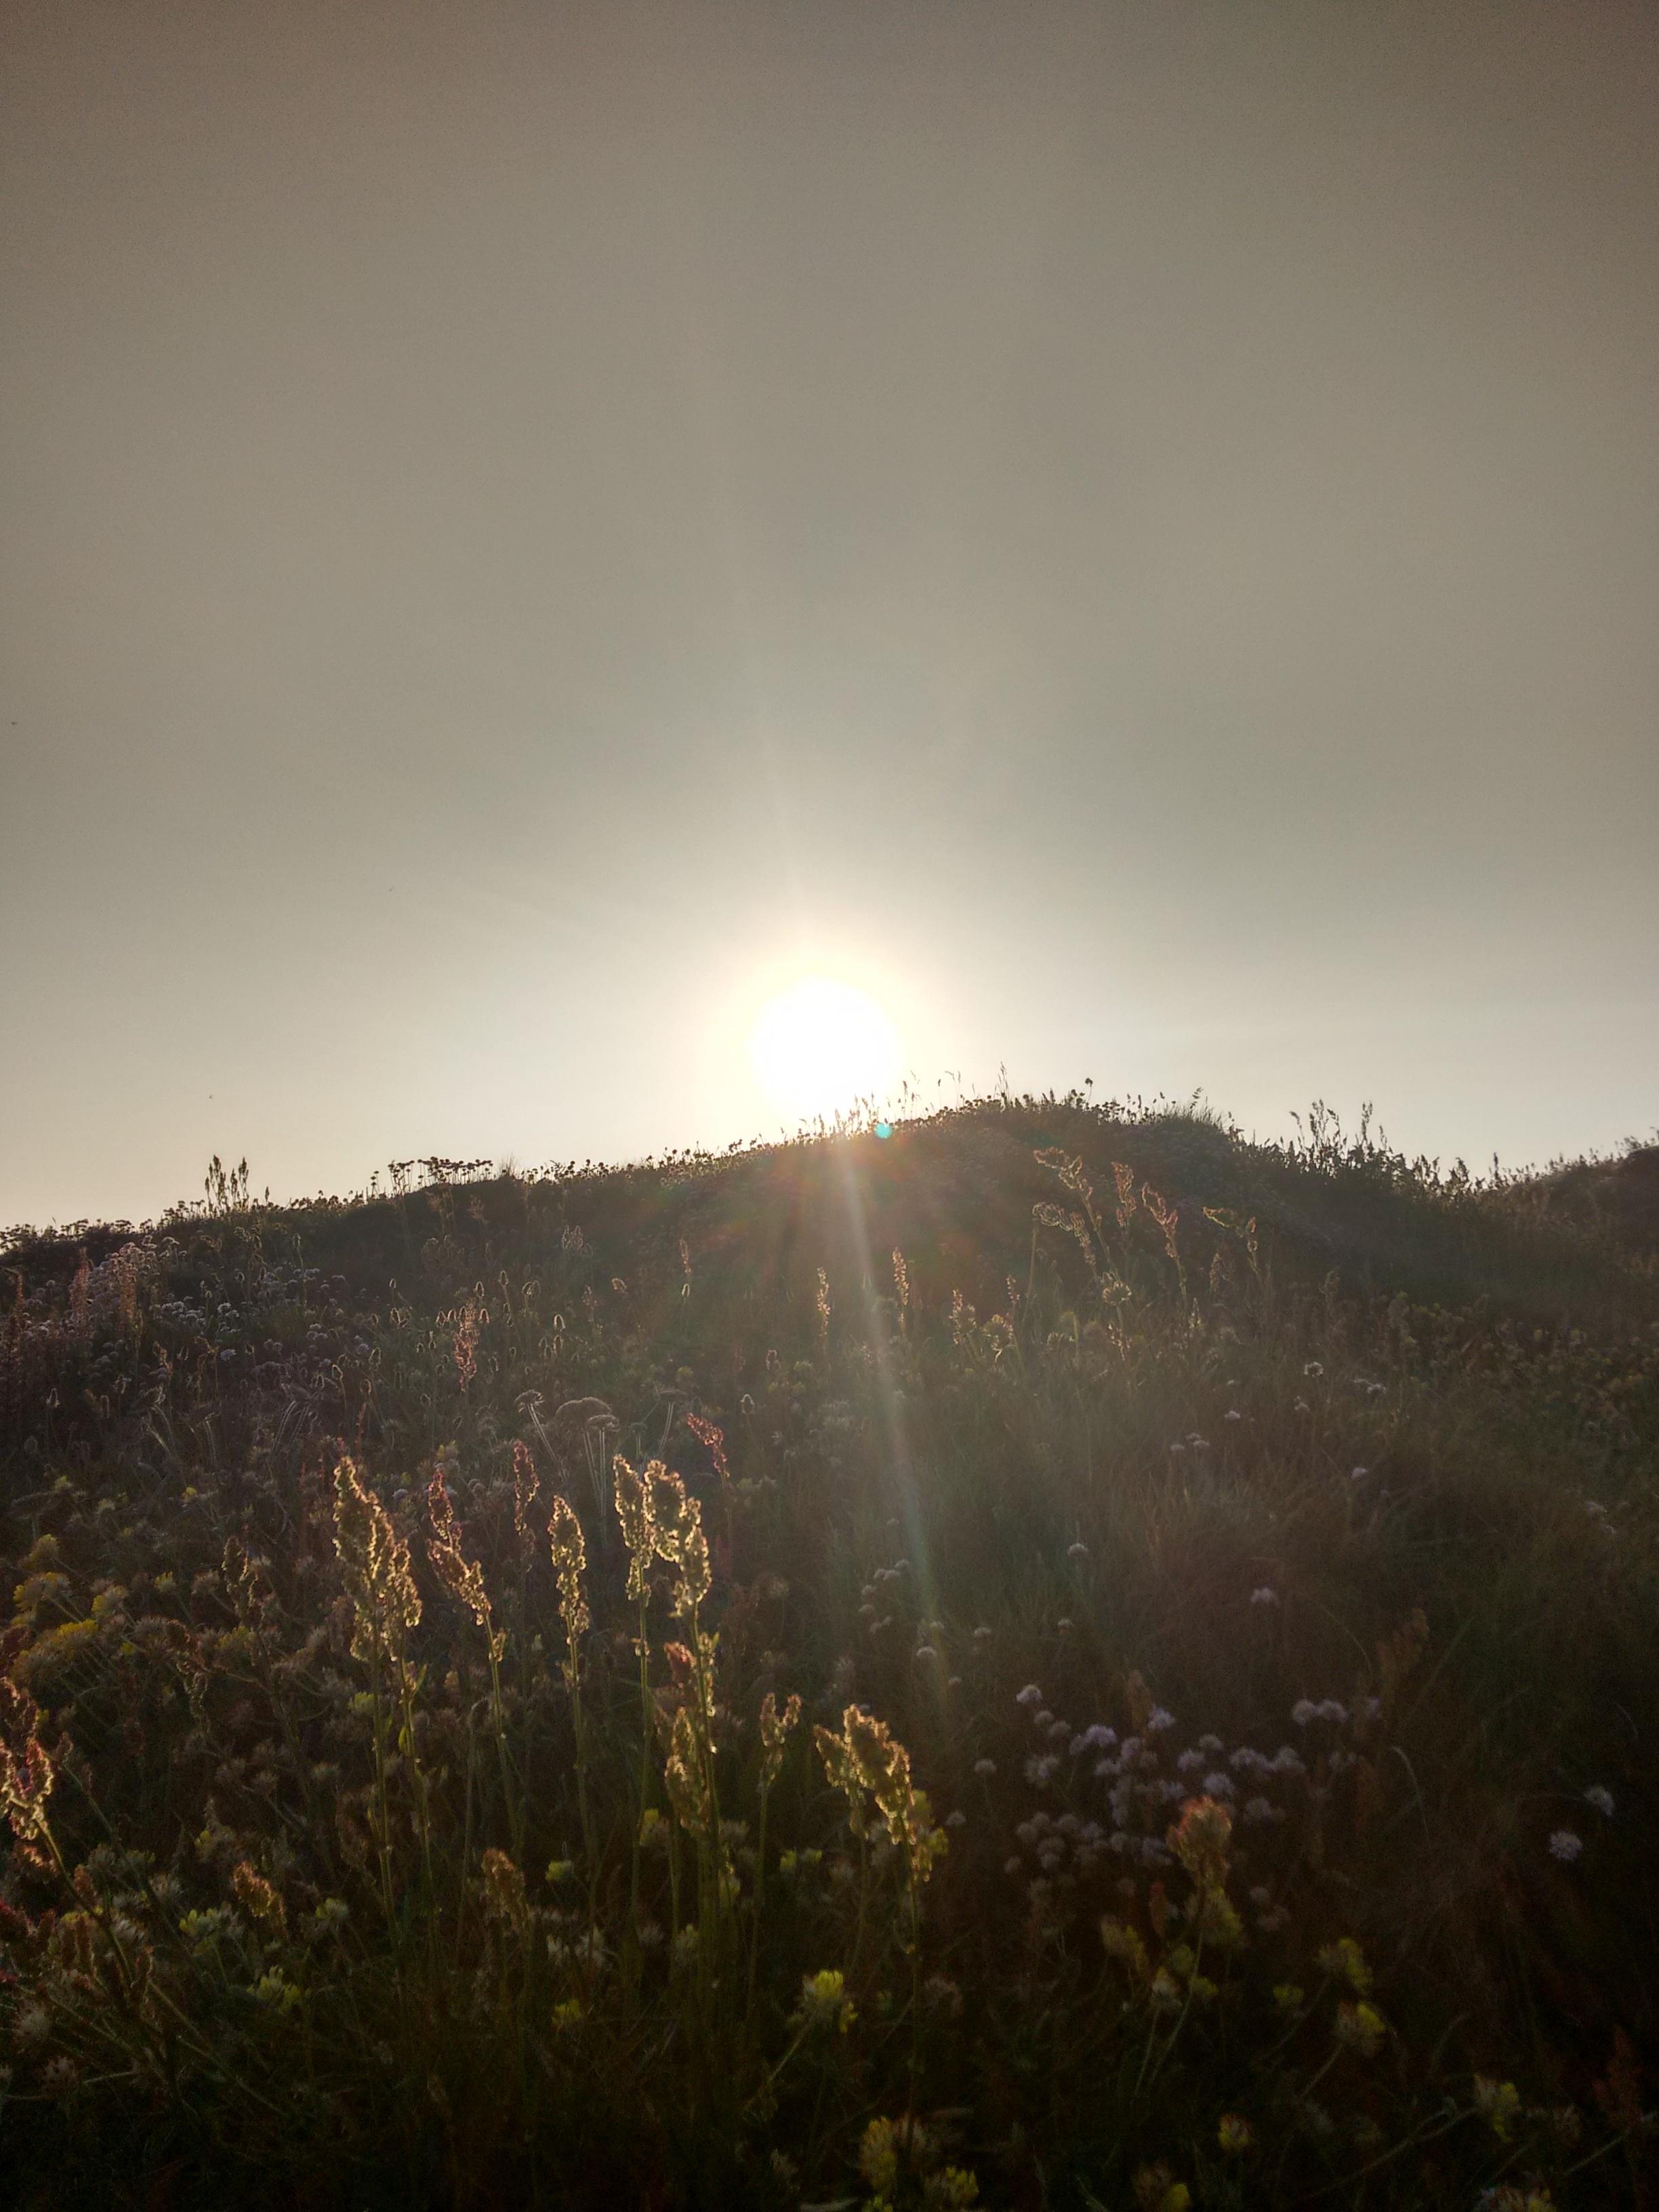 sun fog sunrise trees - photo #26